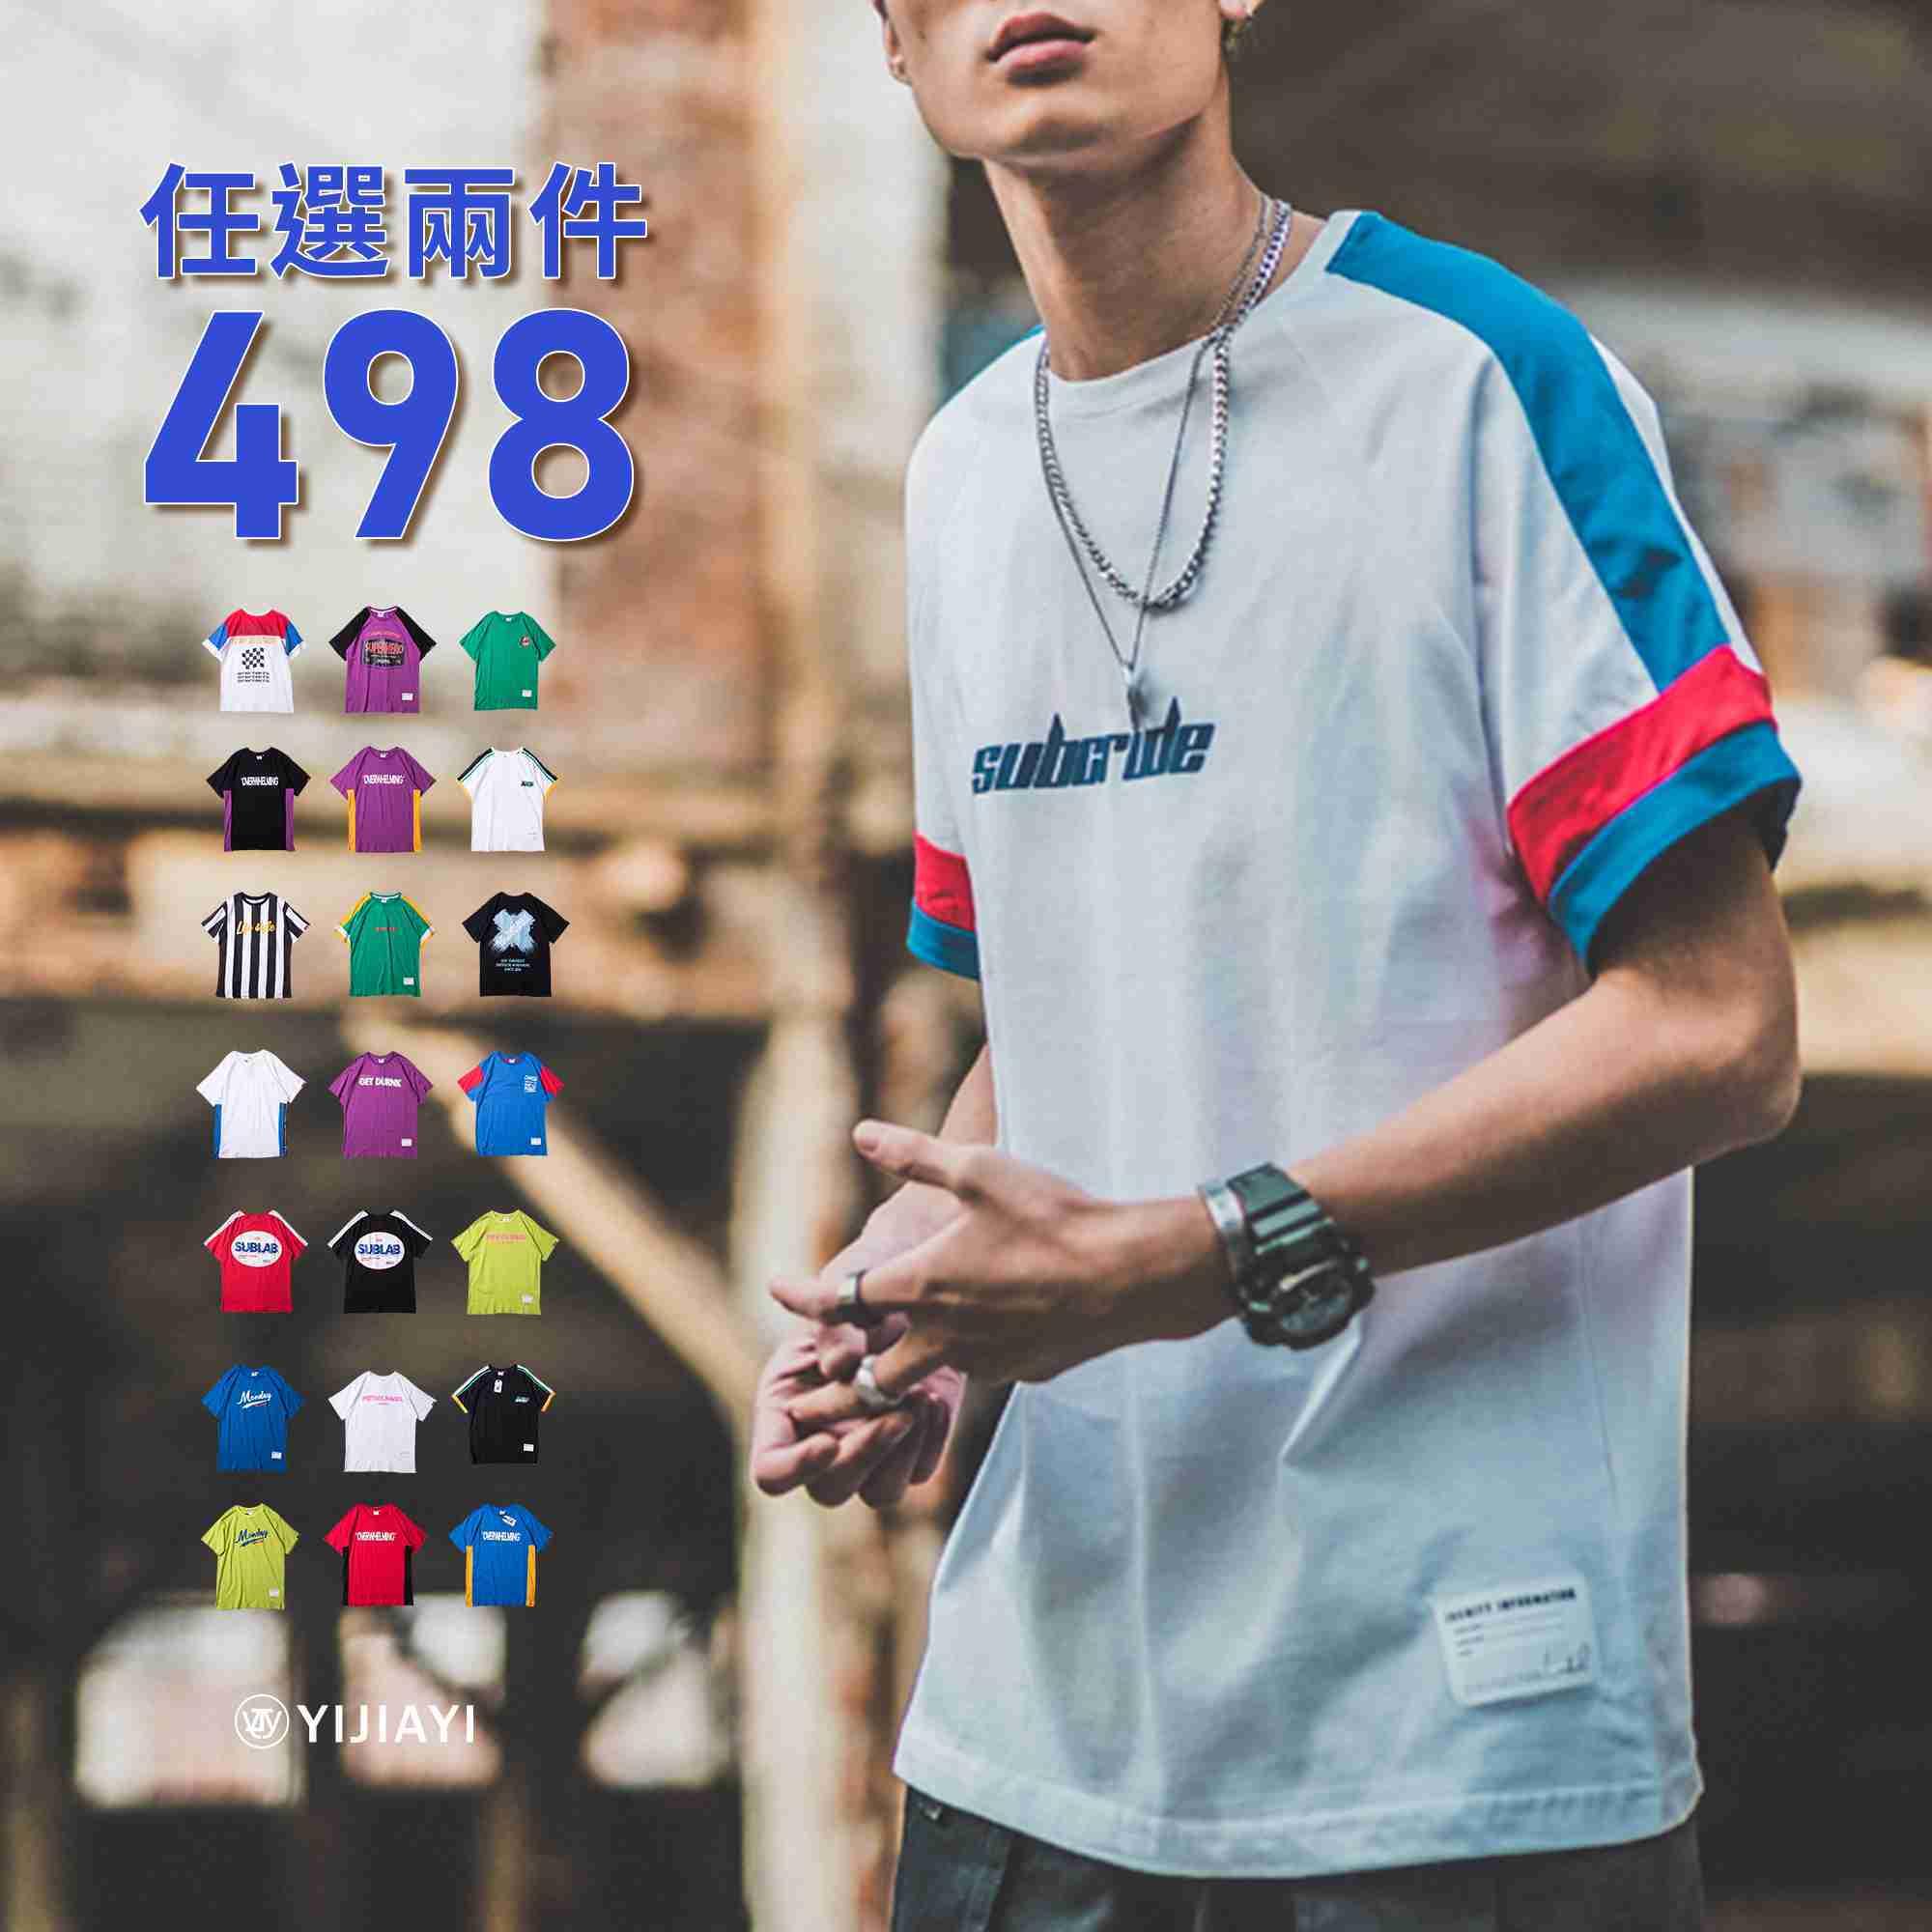 【YIJIAYI】【拚團限量搶購】兩件498 短T 素面 T恤 條紋 上衣 素T (Z001)